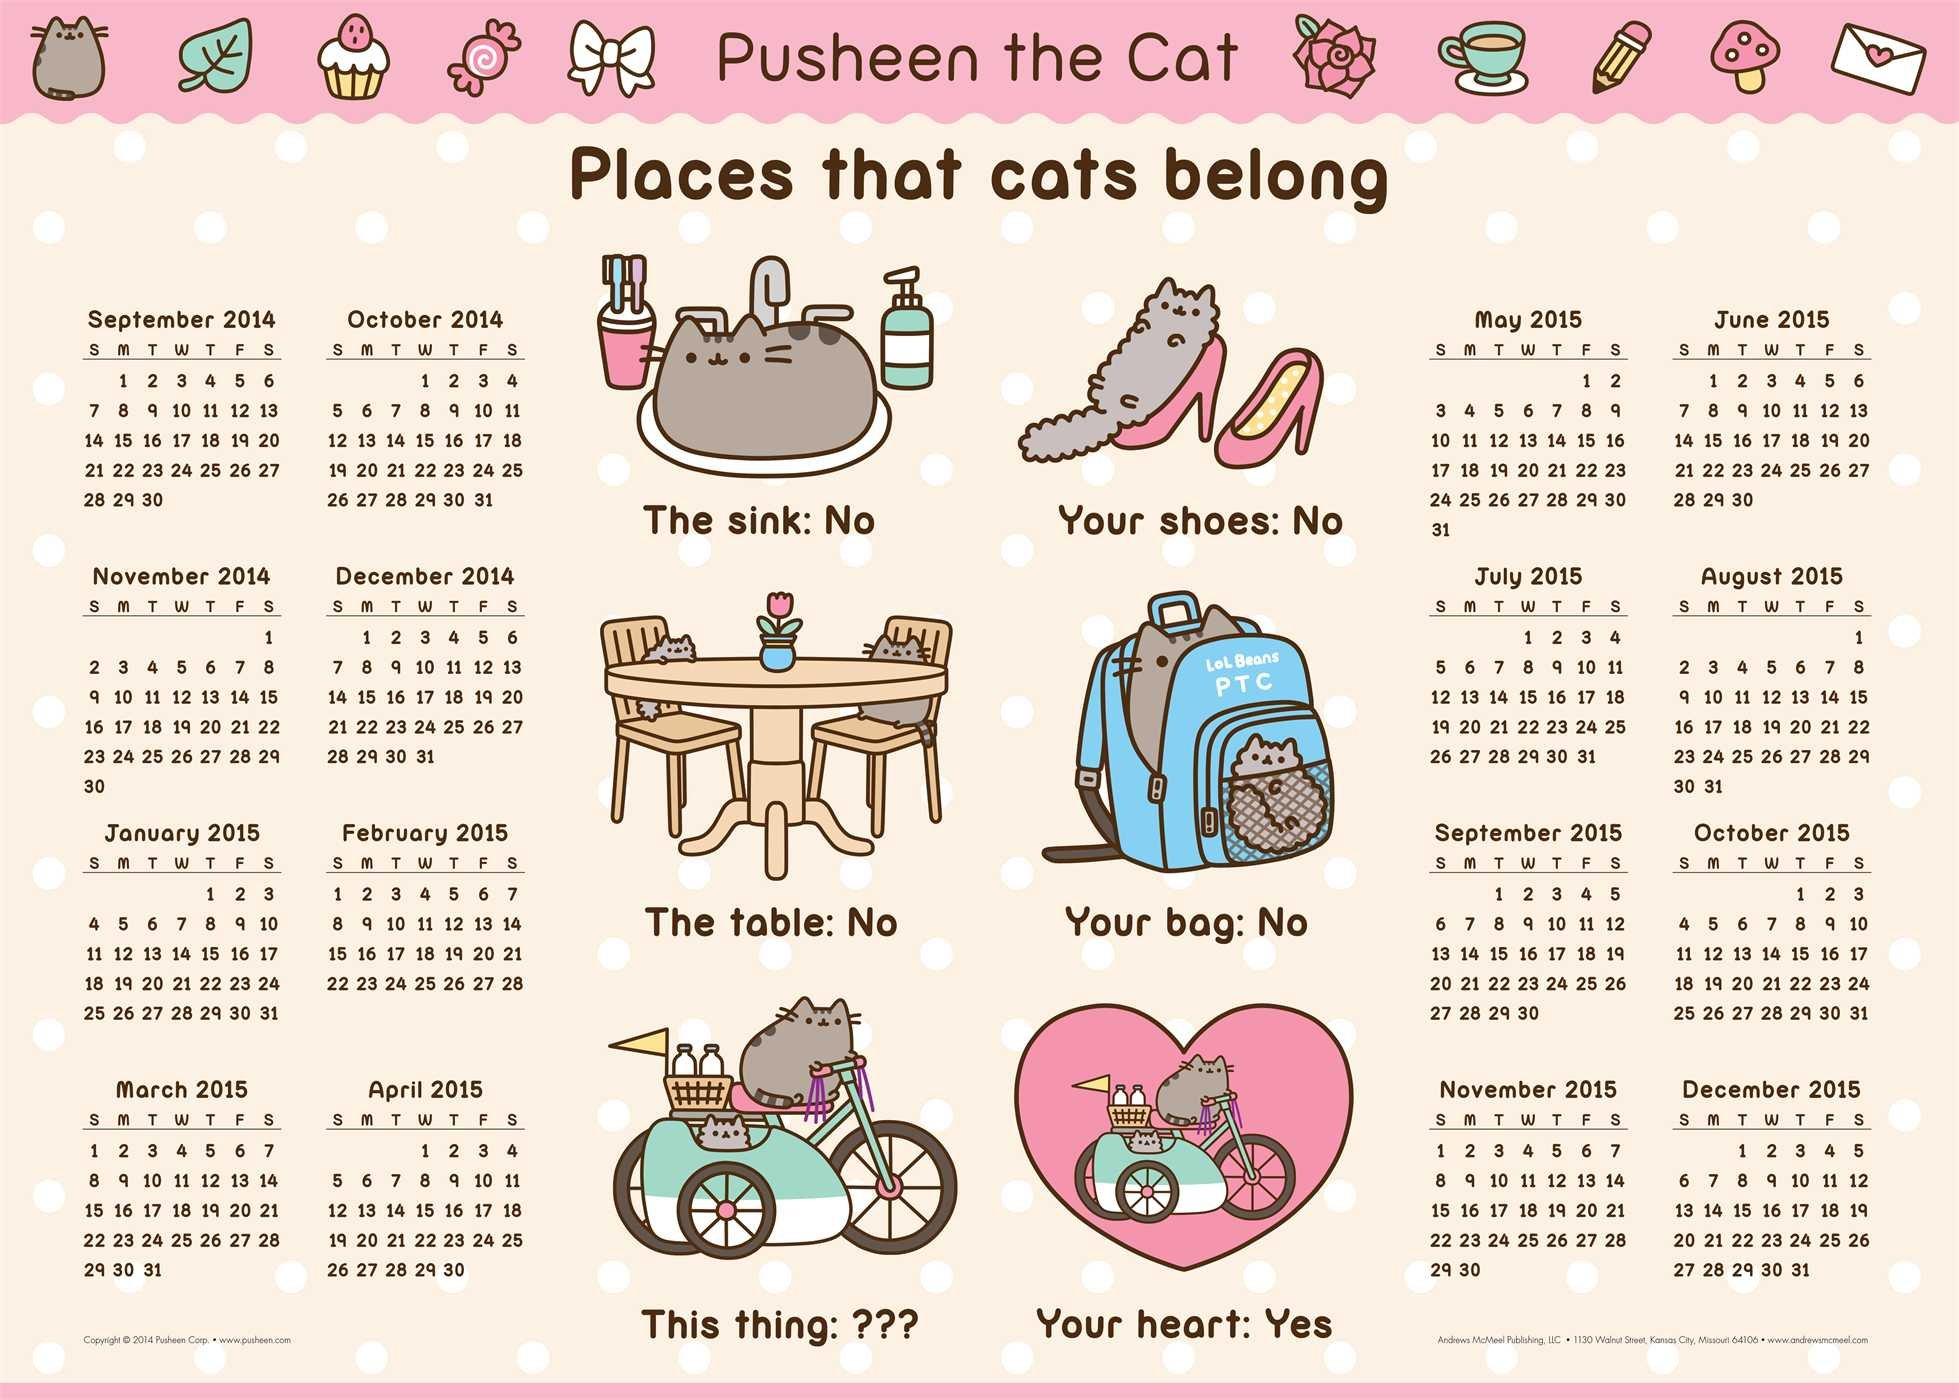 pusheen the cat 2014 15 16 month calendar poster claire belton 9781449458362 amazoncom books